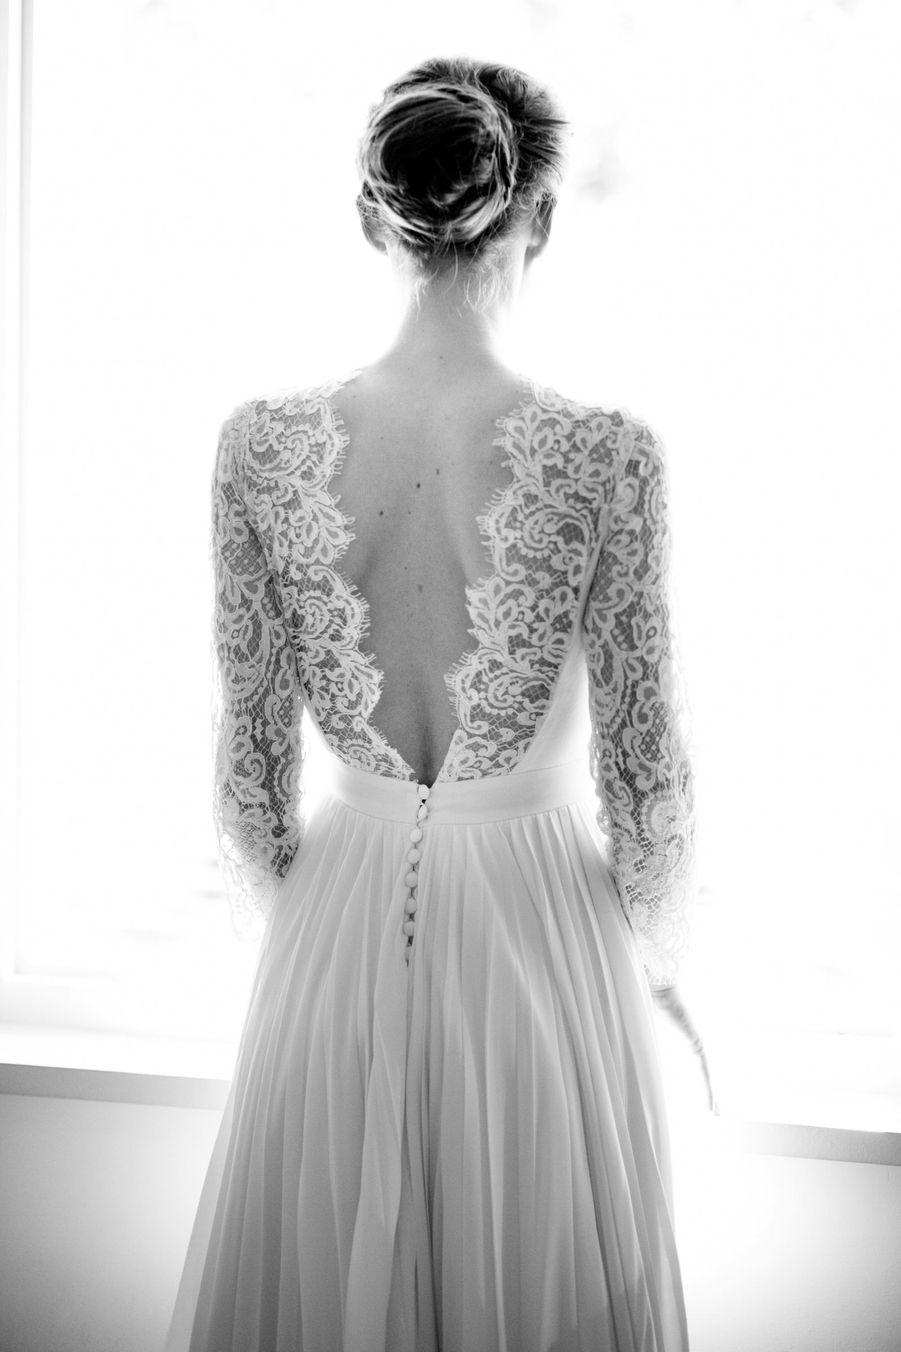 Robe de mariée plissée en crêpe de soiehttps://www.pinterest.fr/pin/337277459573908757/